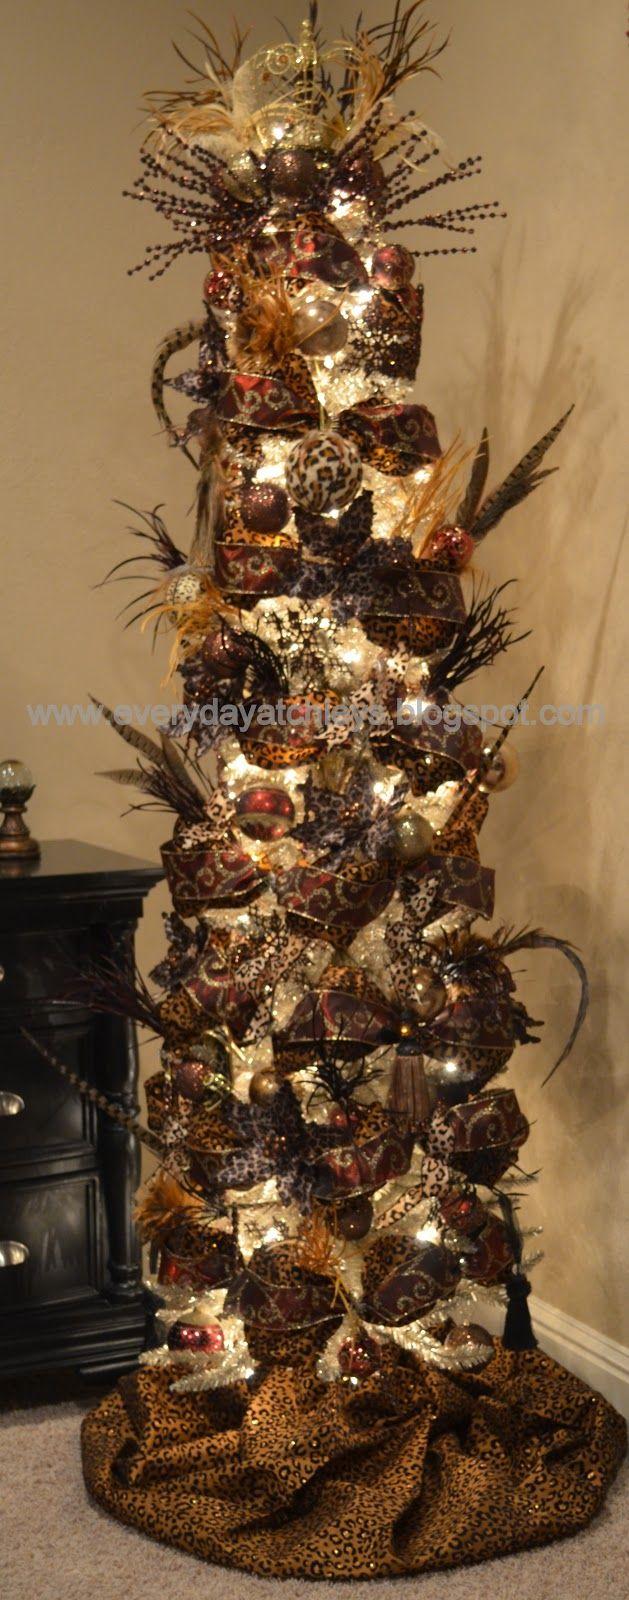 Animal Print Christmas Tree | Crafts/Holidays | Pinterest ...